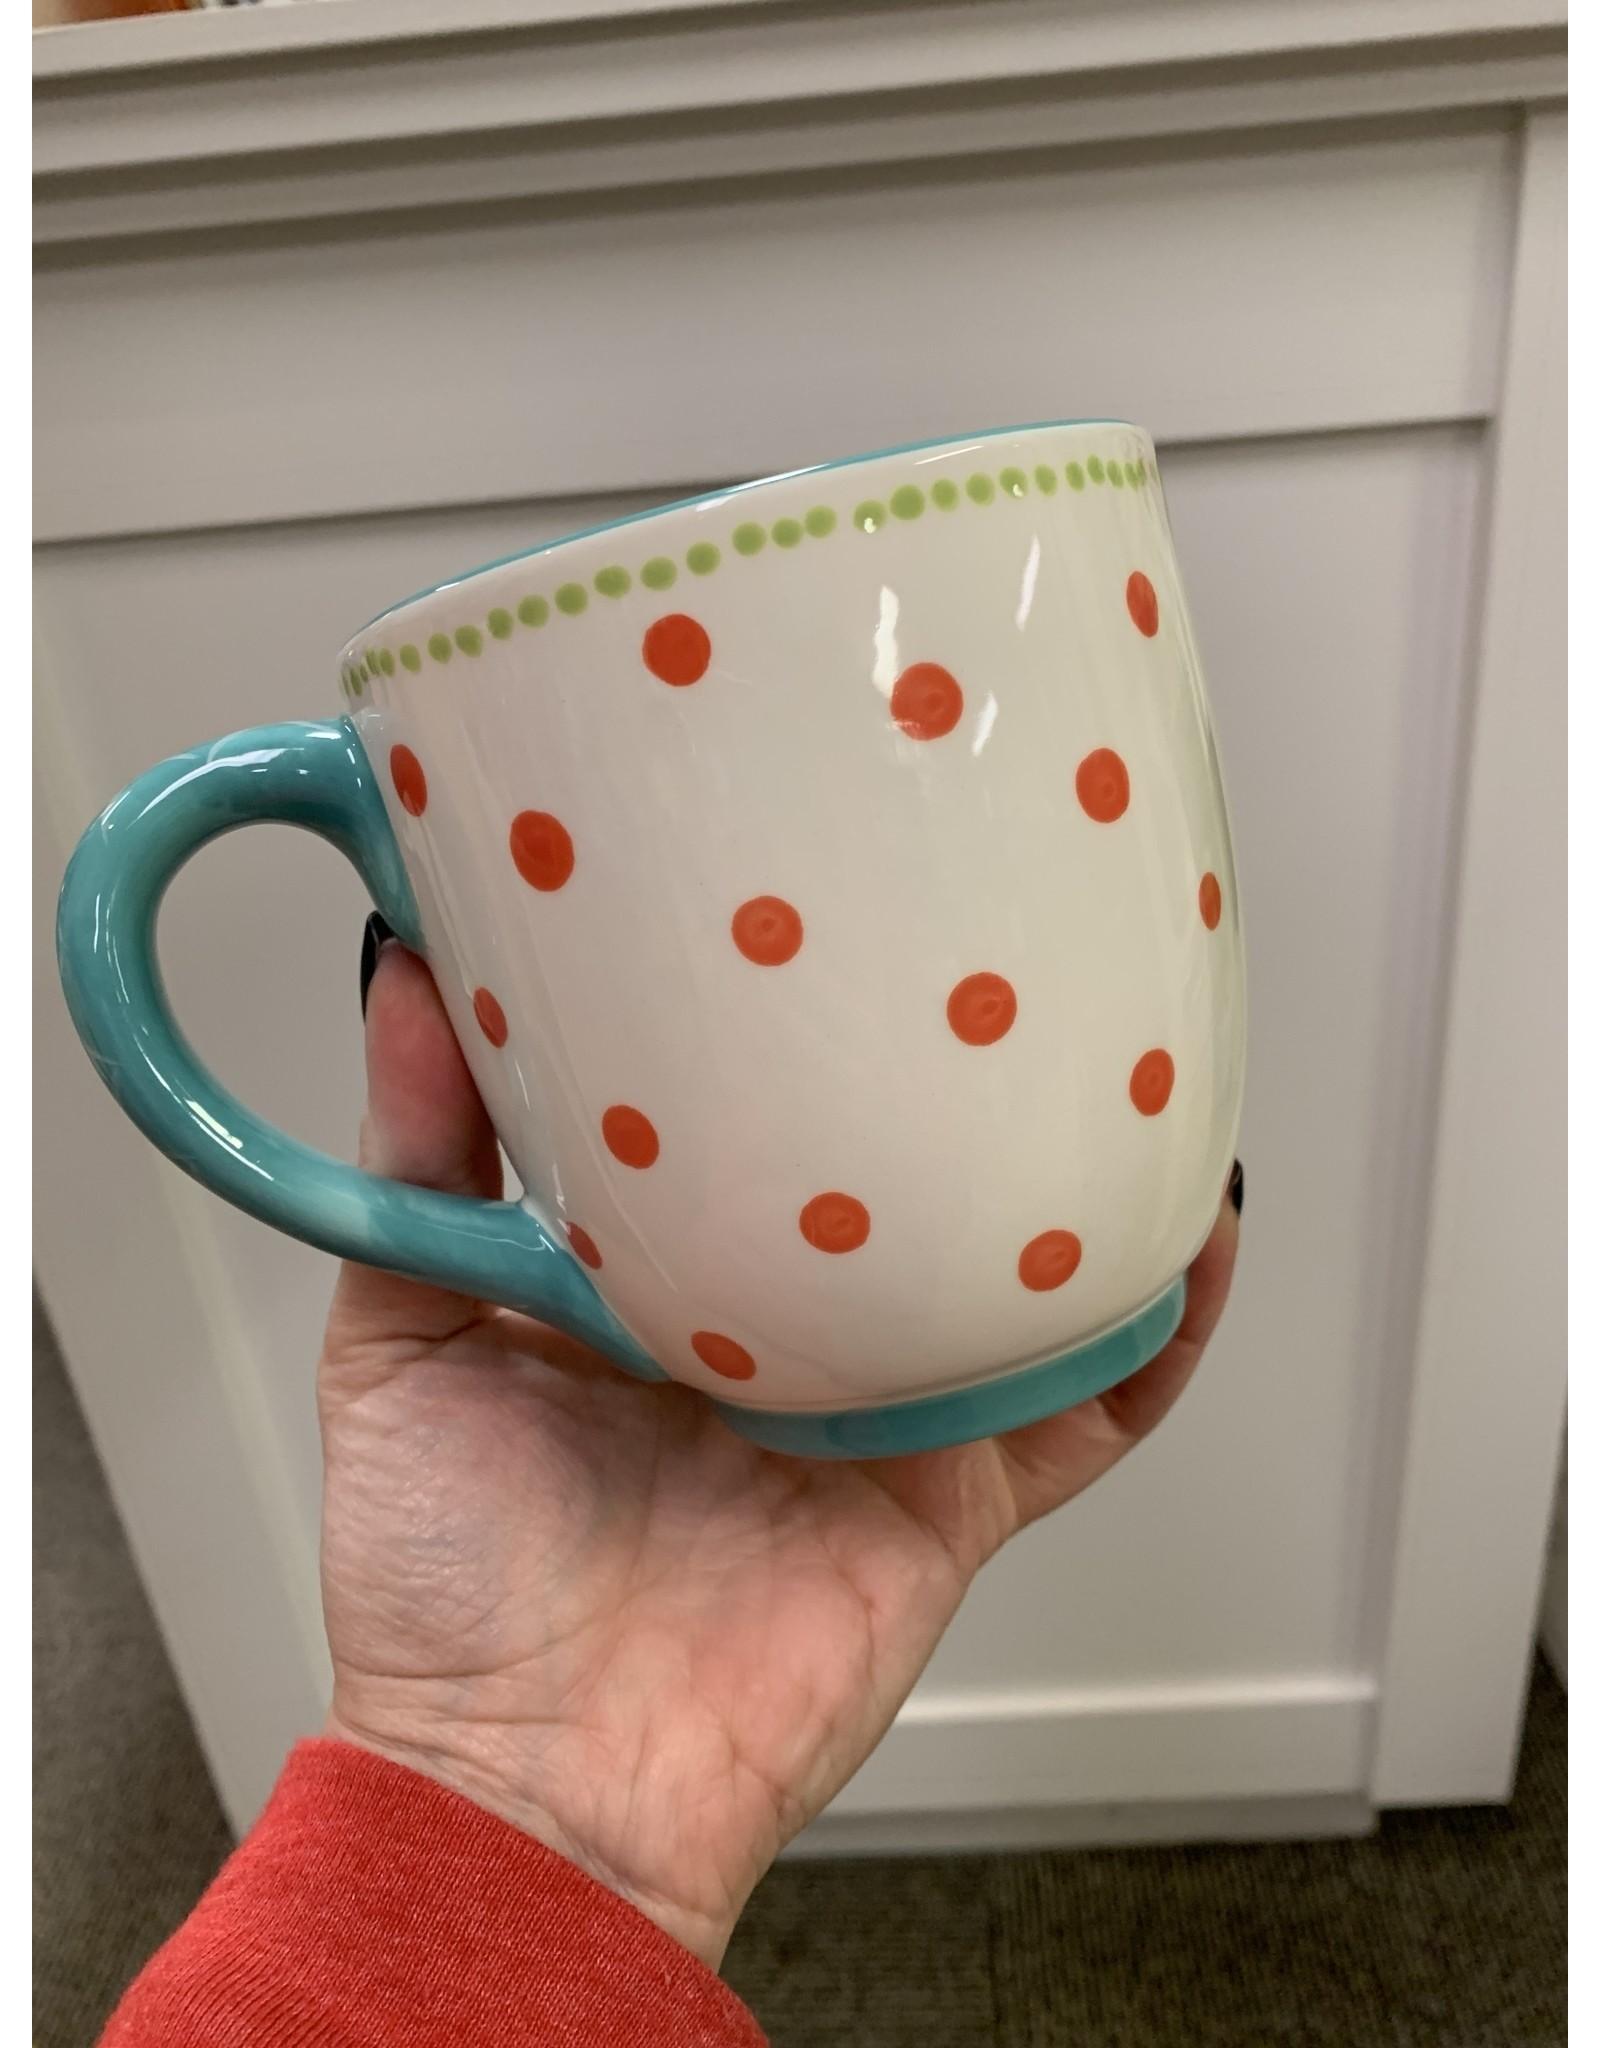 Sisters Make the Best Friends mug